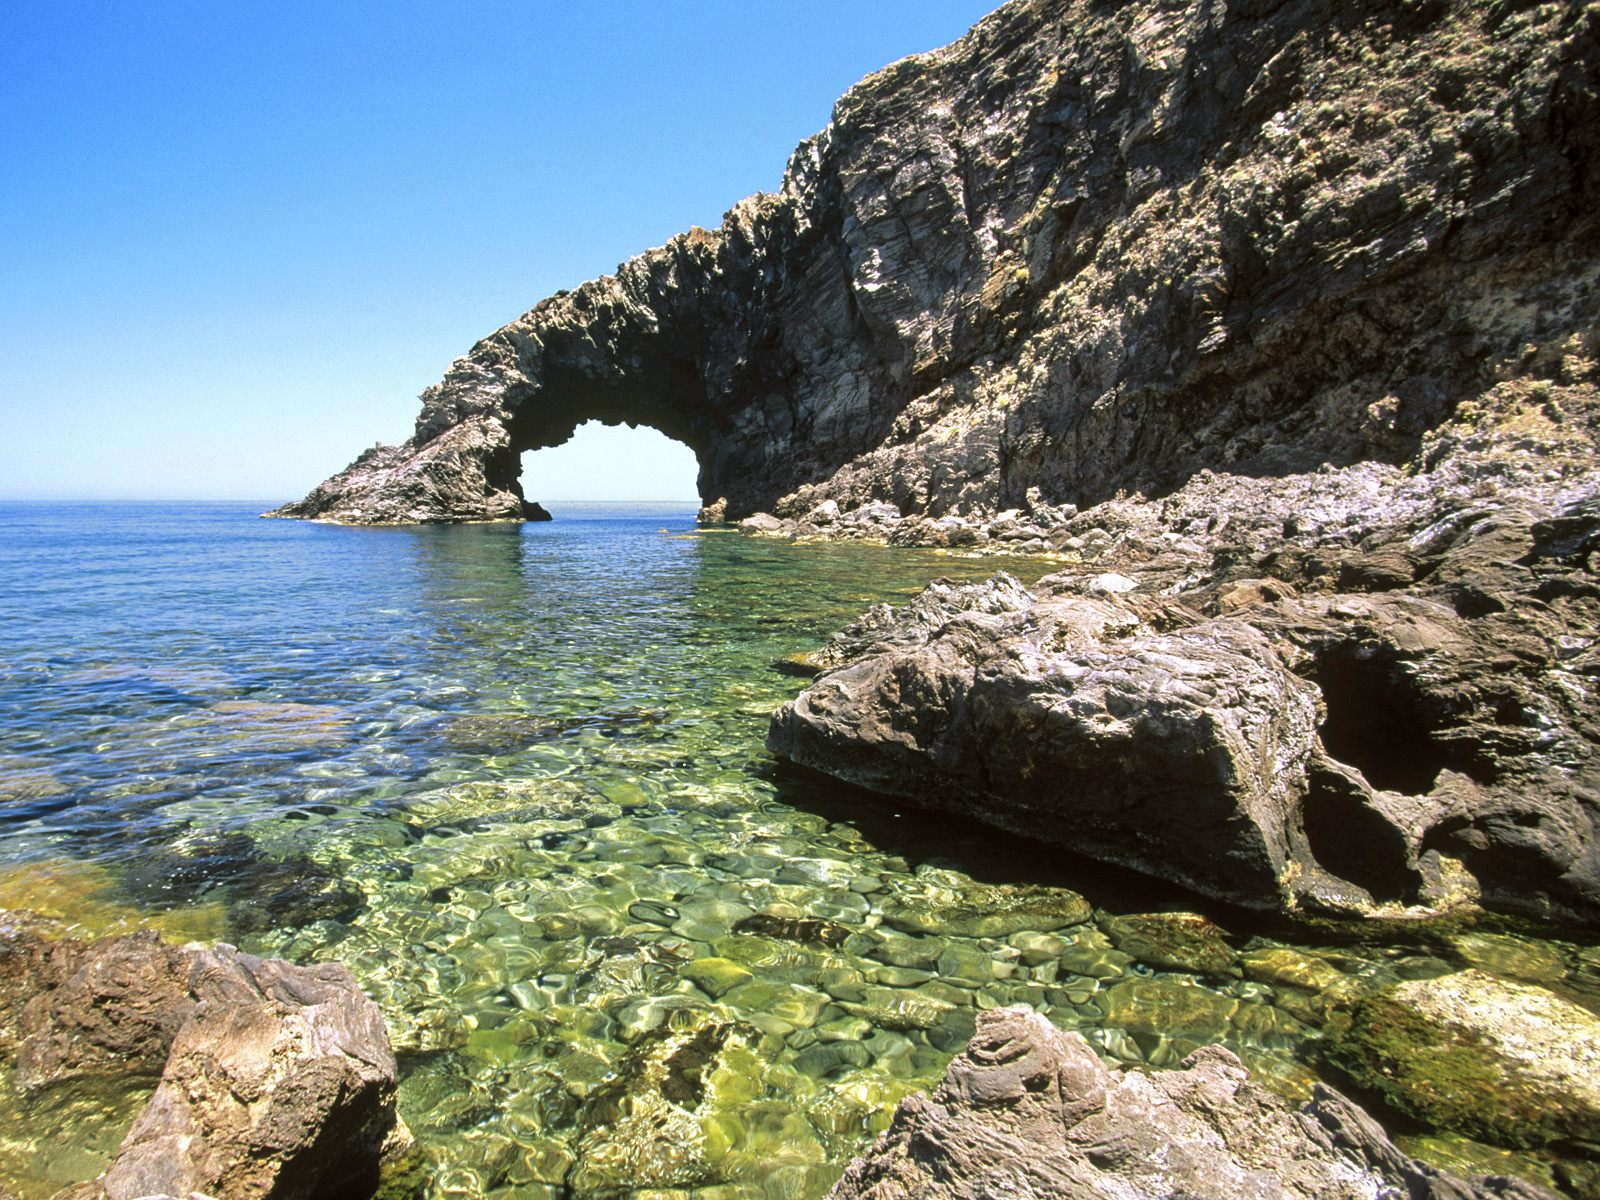 Arco_del'Elefante_Pantelleria_Island_Sicily_Italy.jpg